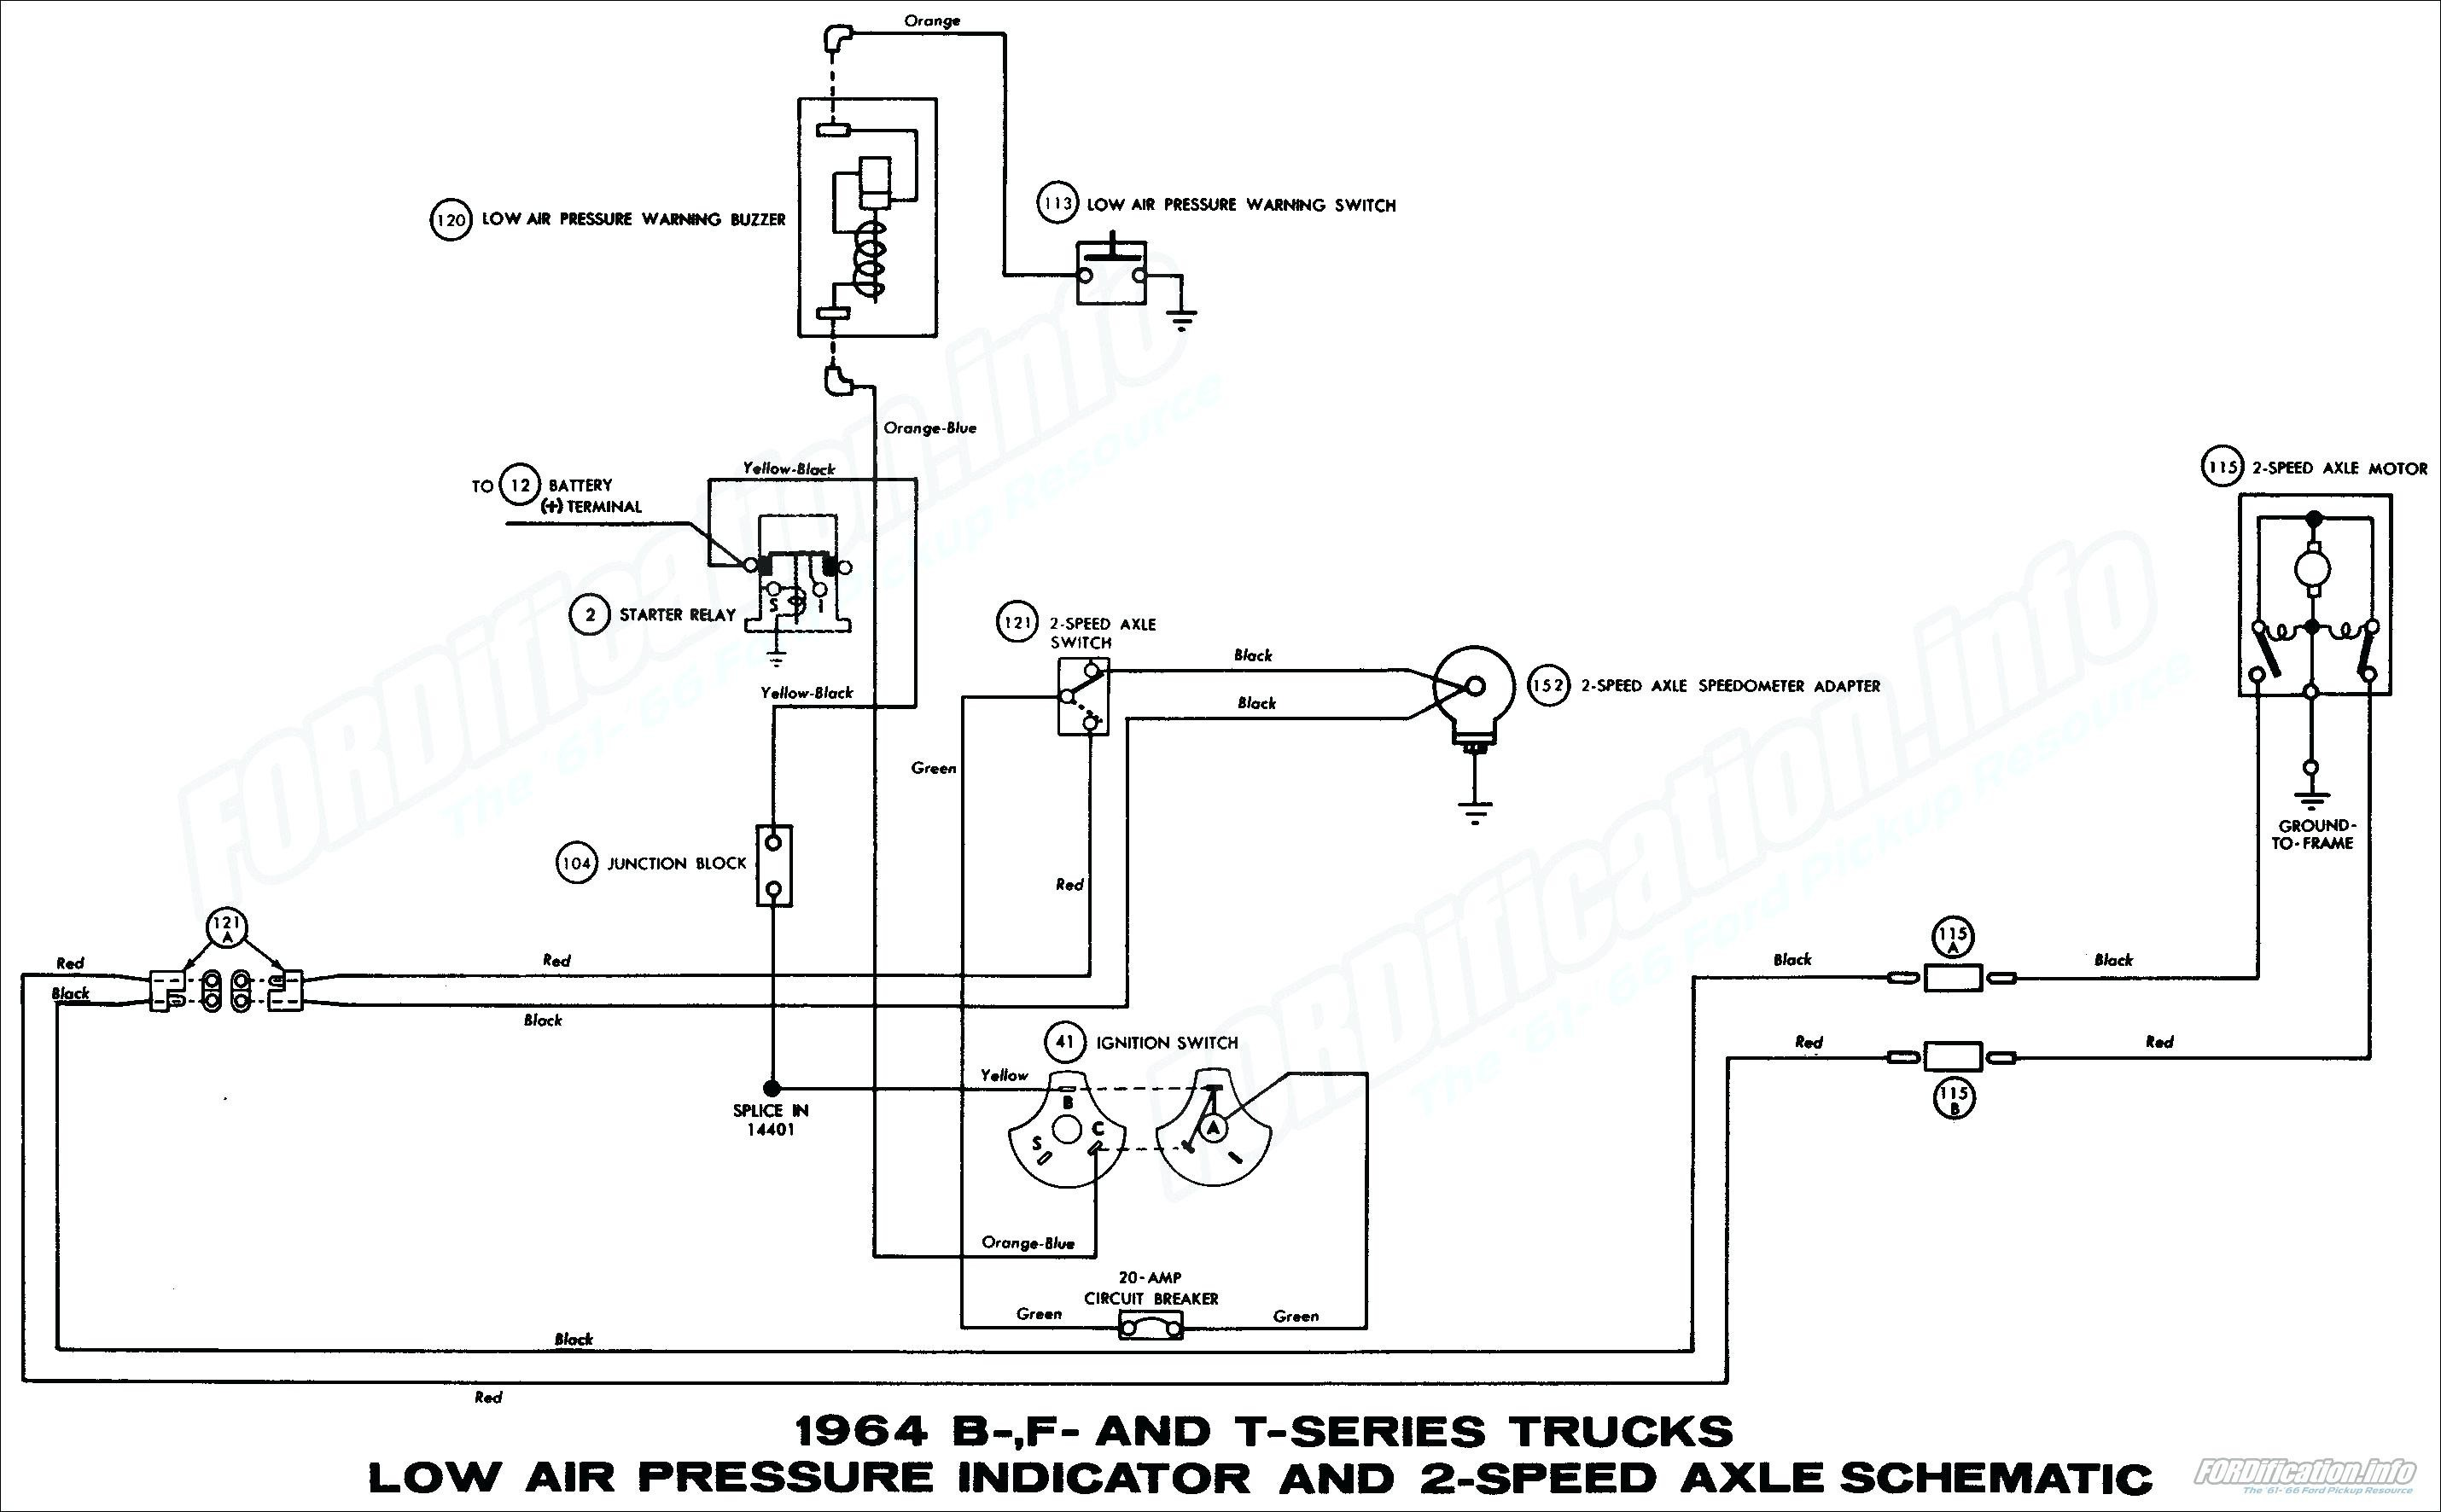 air compressor wiring diagram 240v wiring diagram image rh mainetreasurechest com air compressor power diagram fresh air pressor pressure switch wiring diagram wiring air pressor t30 wiring diagram air pressors wiring